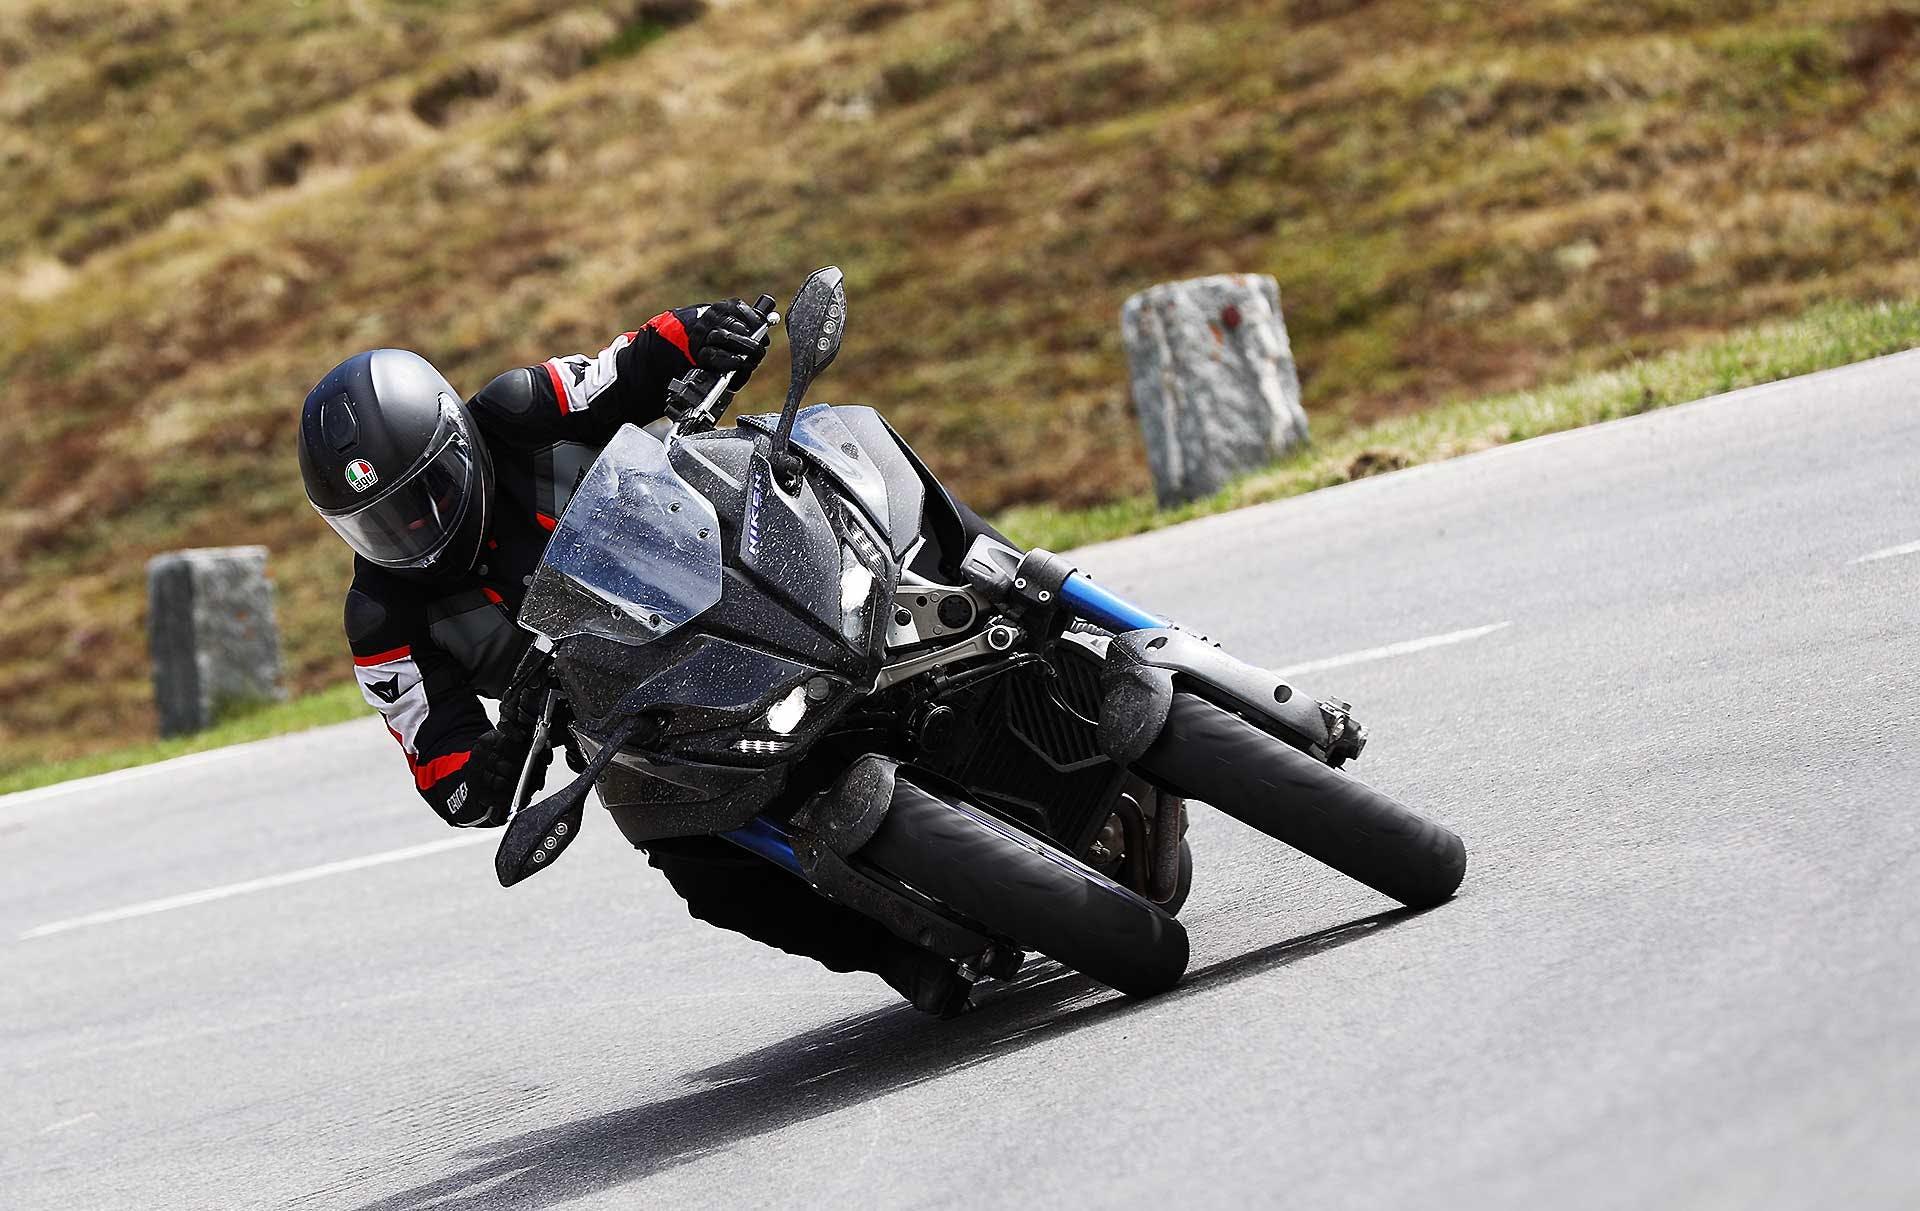 Yamaha Niken movimento in piega frontale